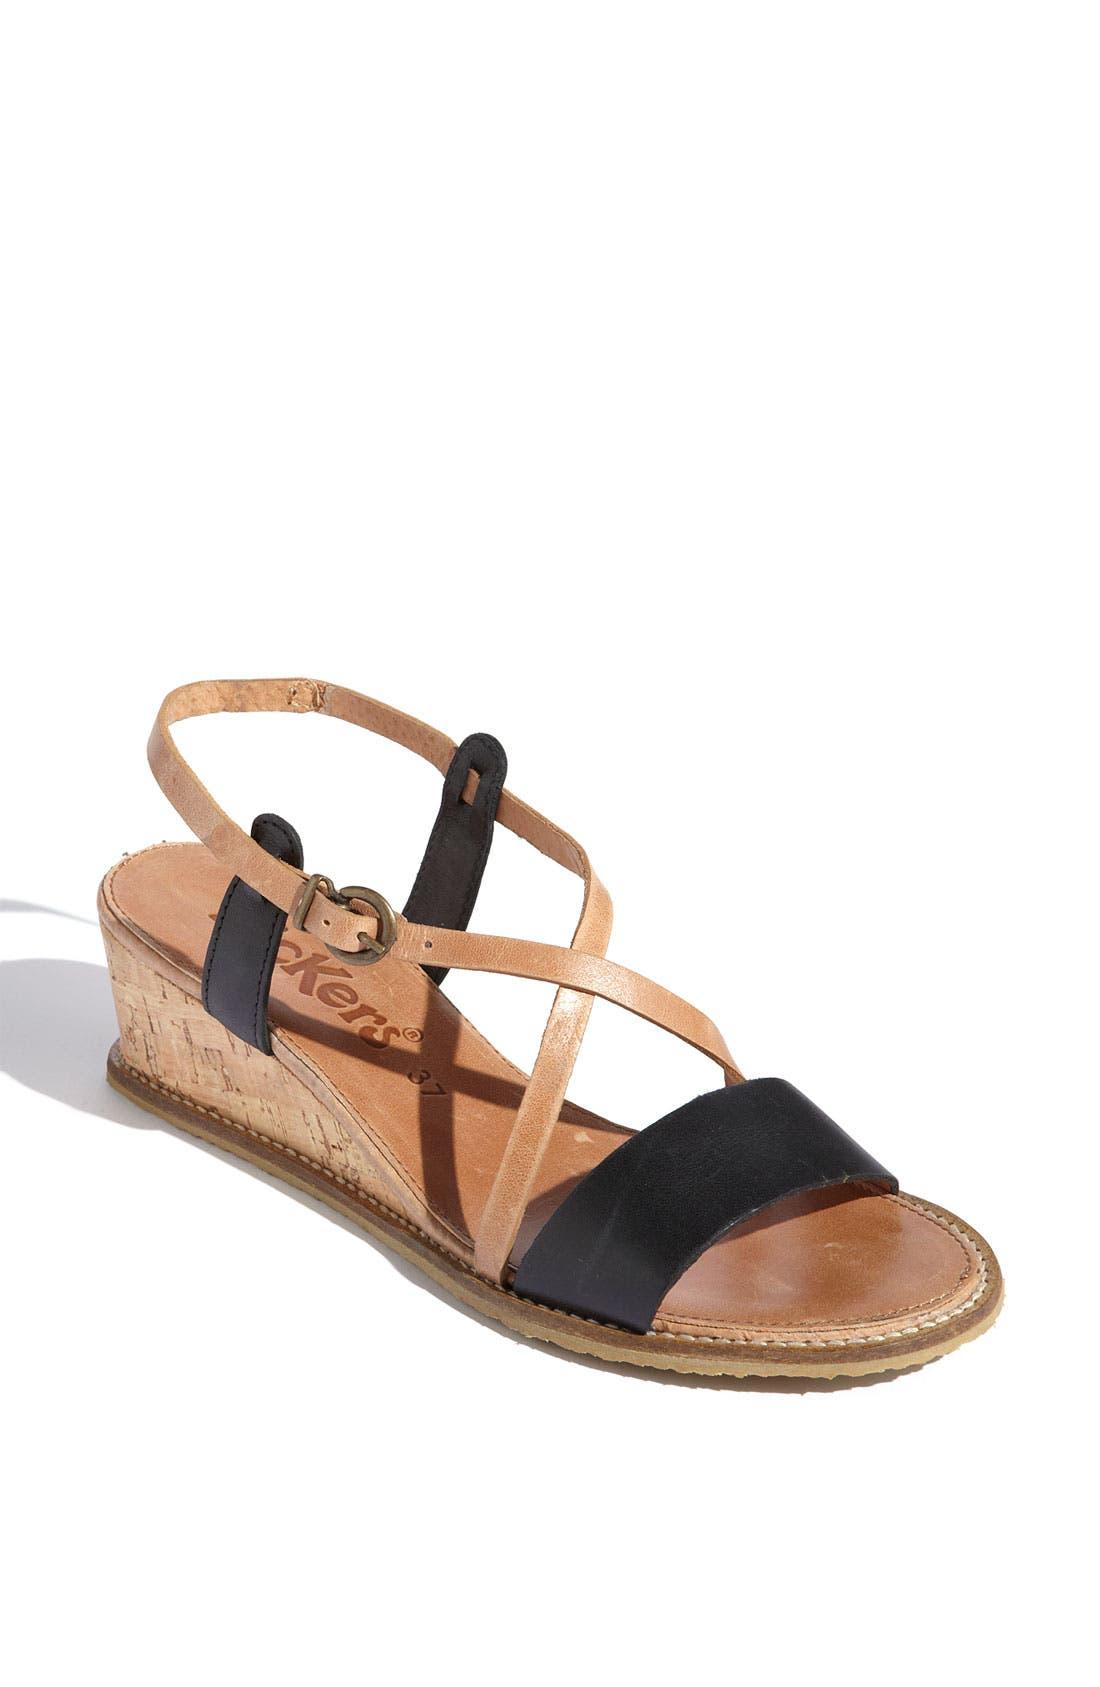 Main Image - Kickers 'Sushidue' Sandal